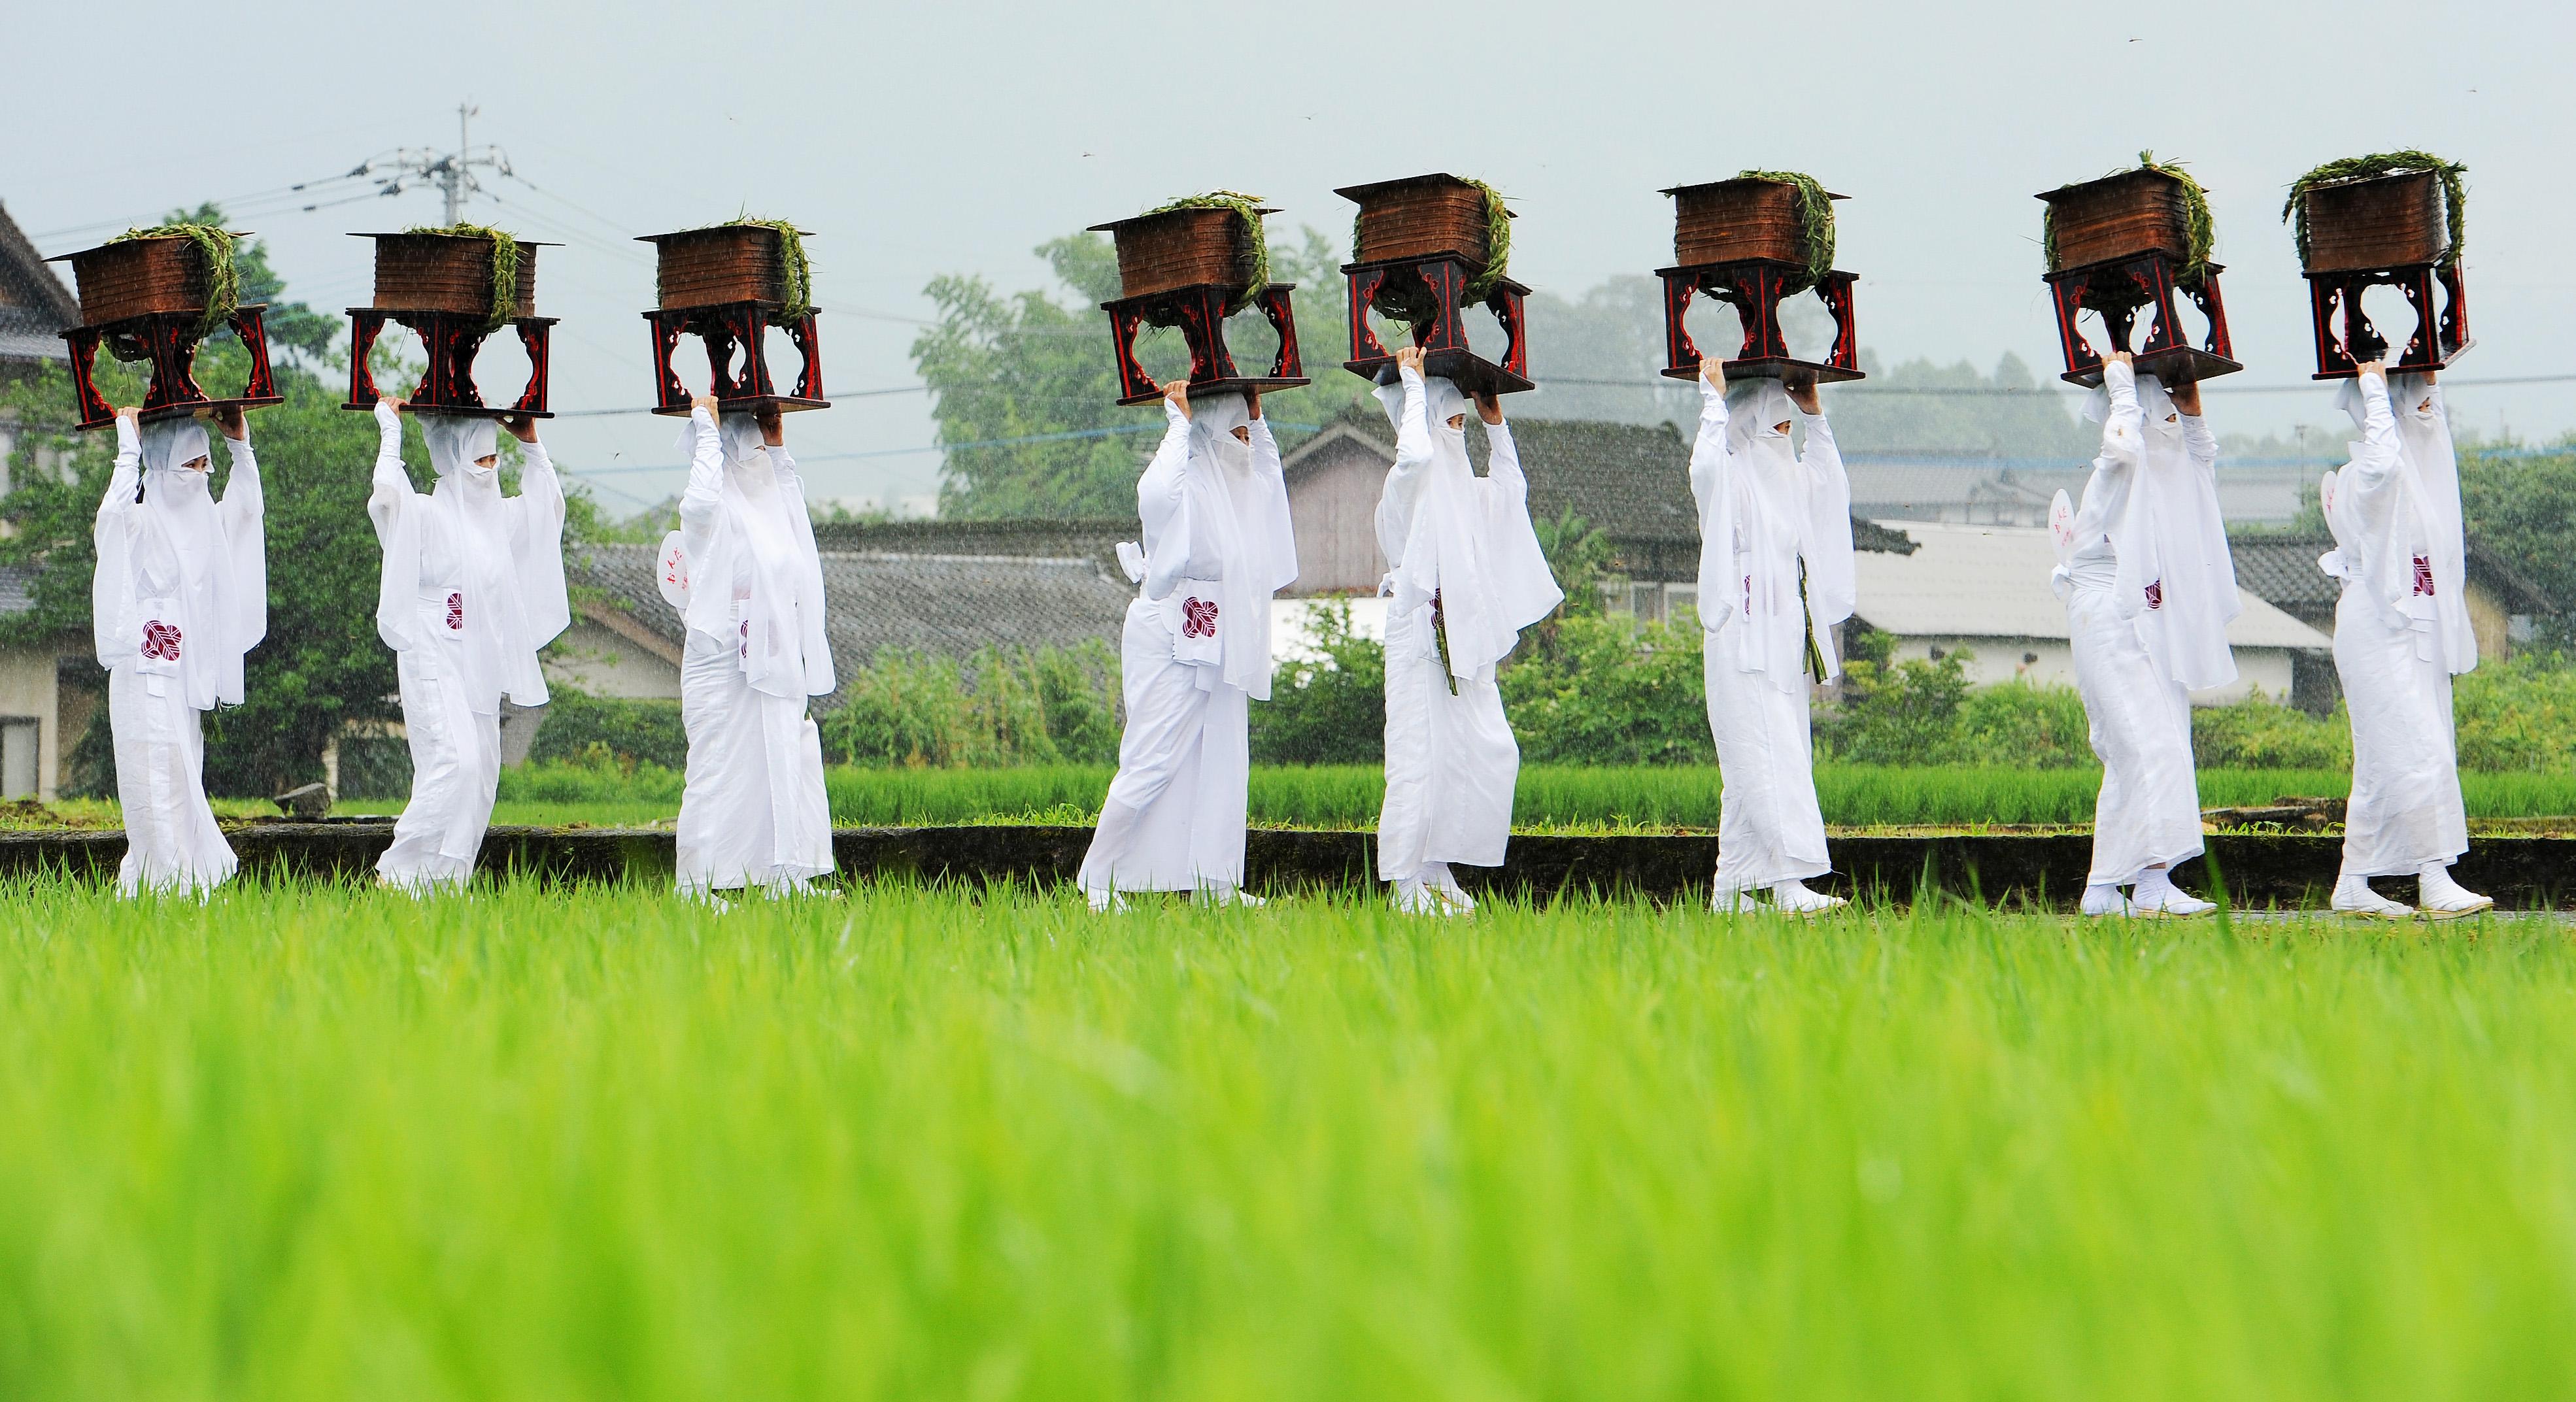 Unari walking along path between rice paddies (in Aso-shi, Kumamoto Prefecture)